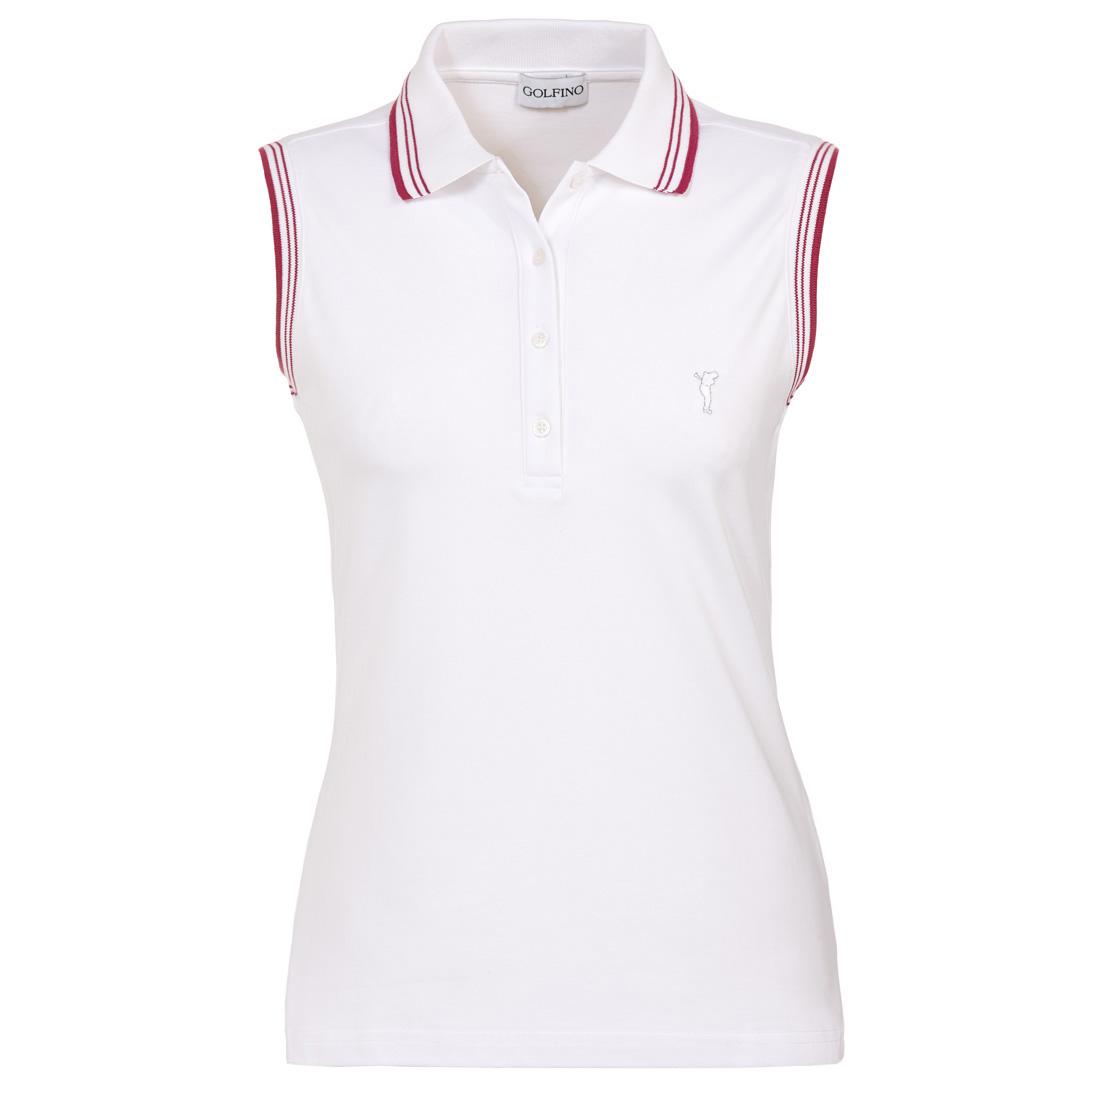 Ärmelloses Funktions-Golfpoloshirt mit Sun Protection und Kontraststreifen